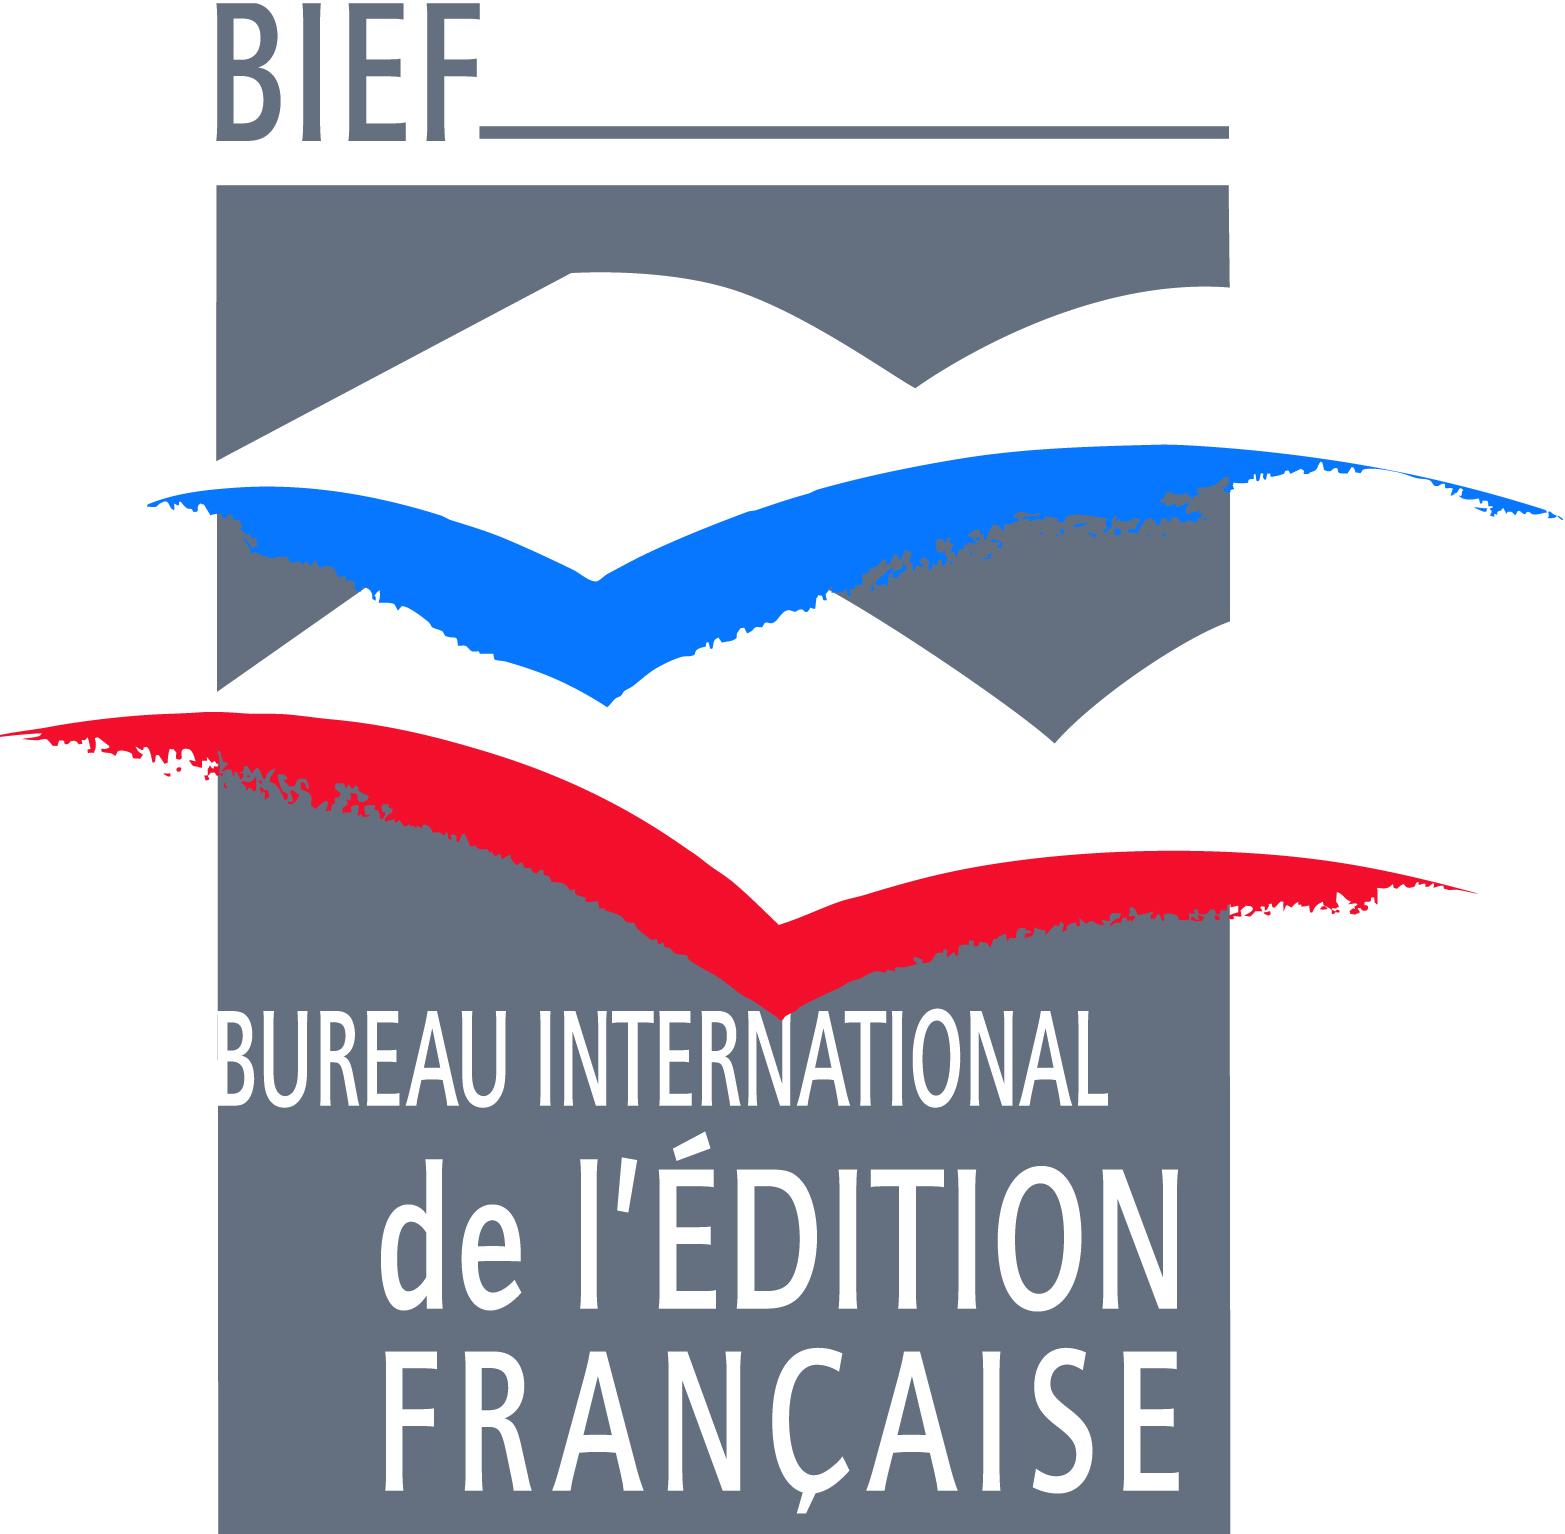 bureau international de l edition fran aise bief france unifrance films. Black Bedroom Furniture Sets. Home Design Ideas